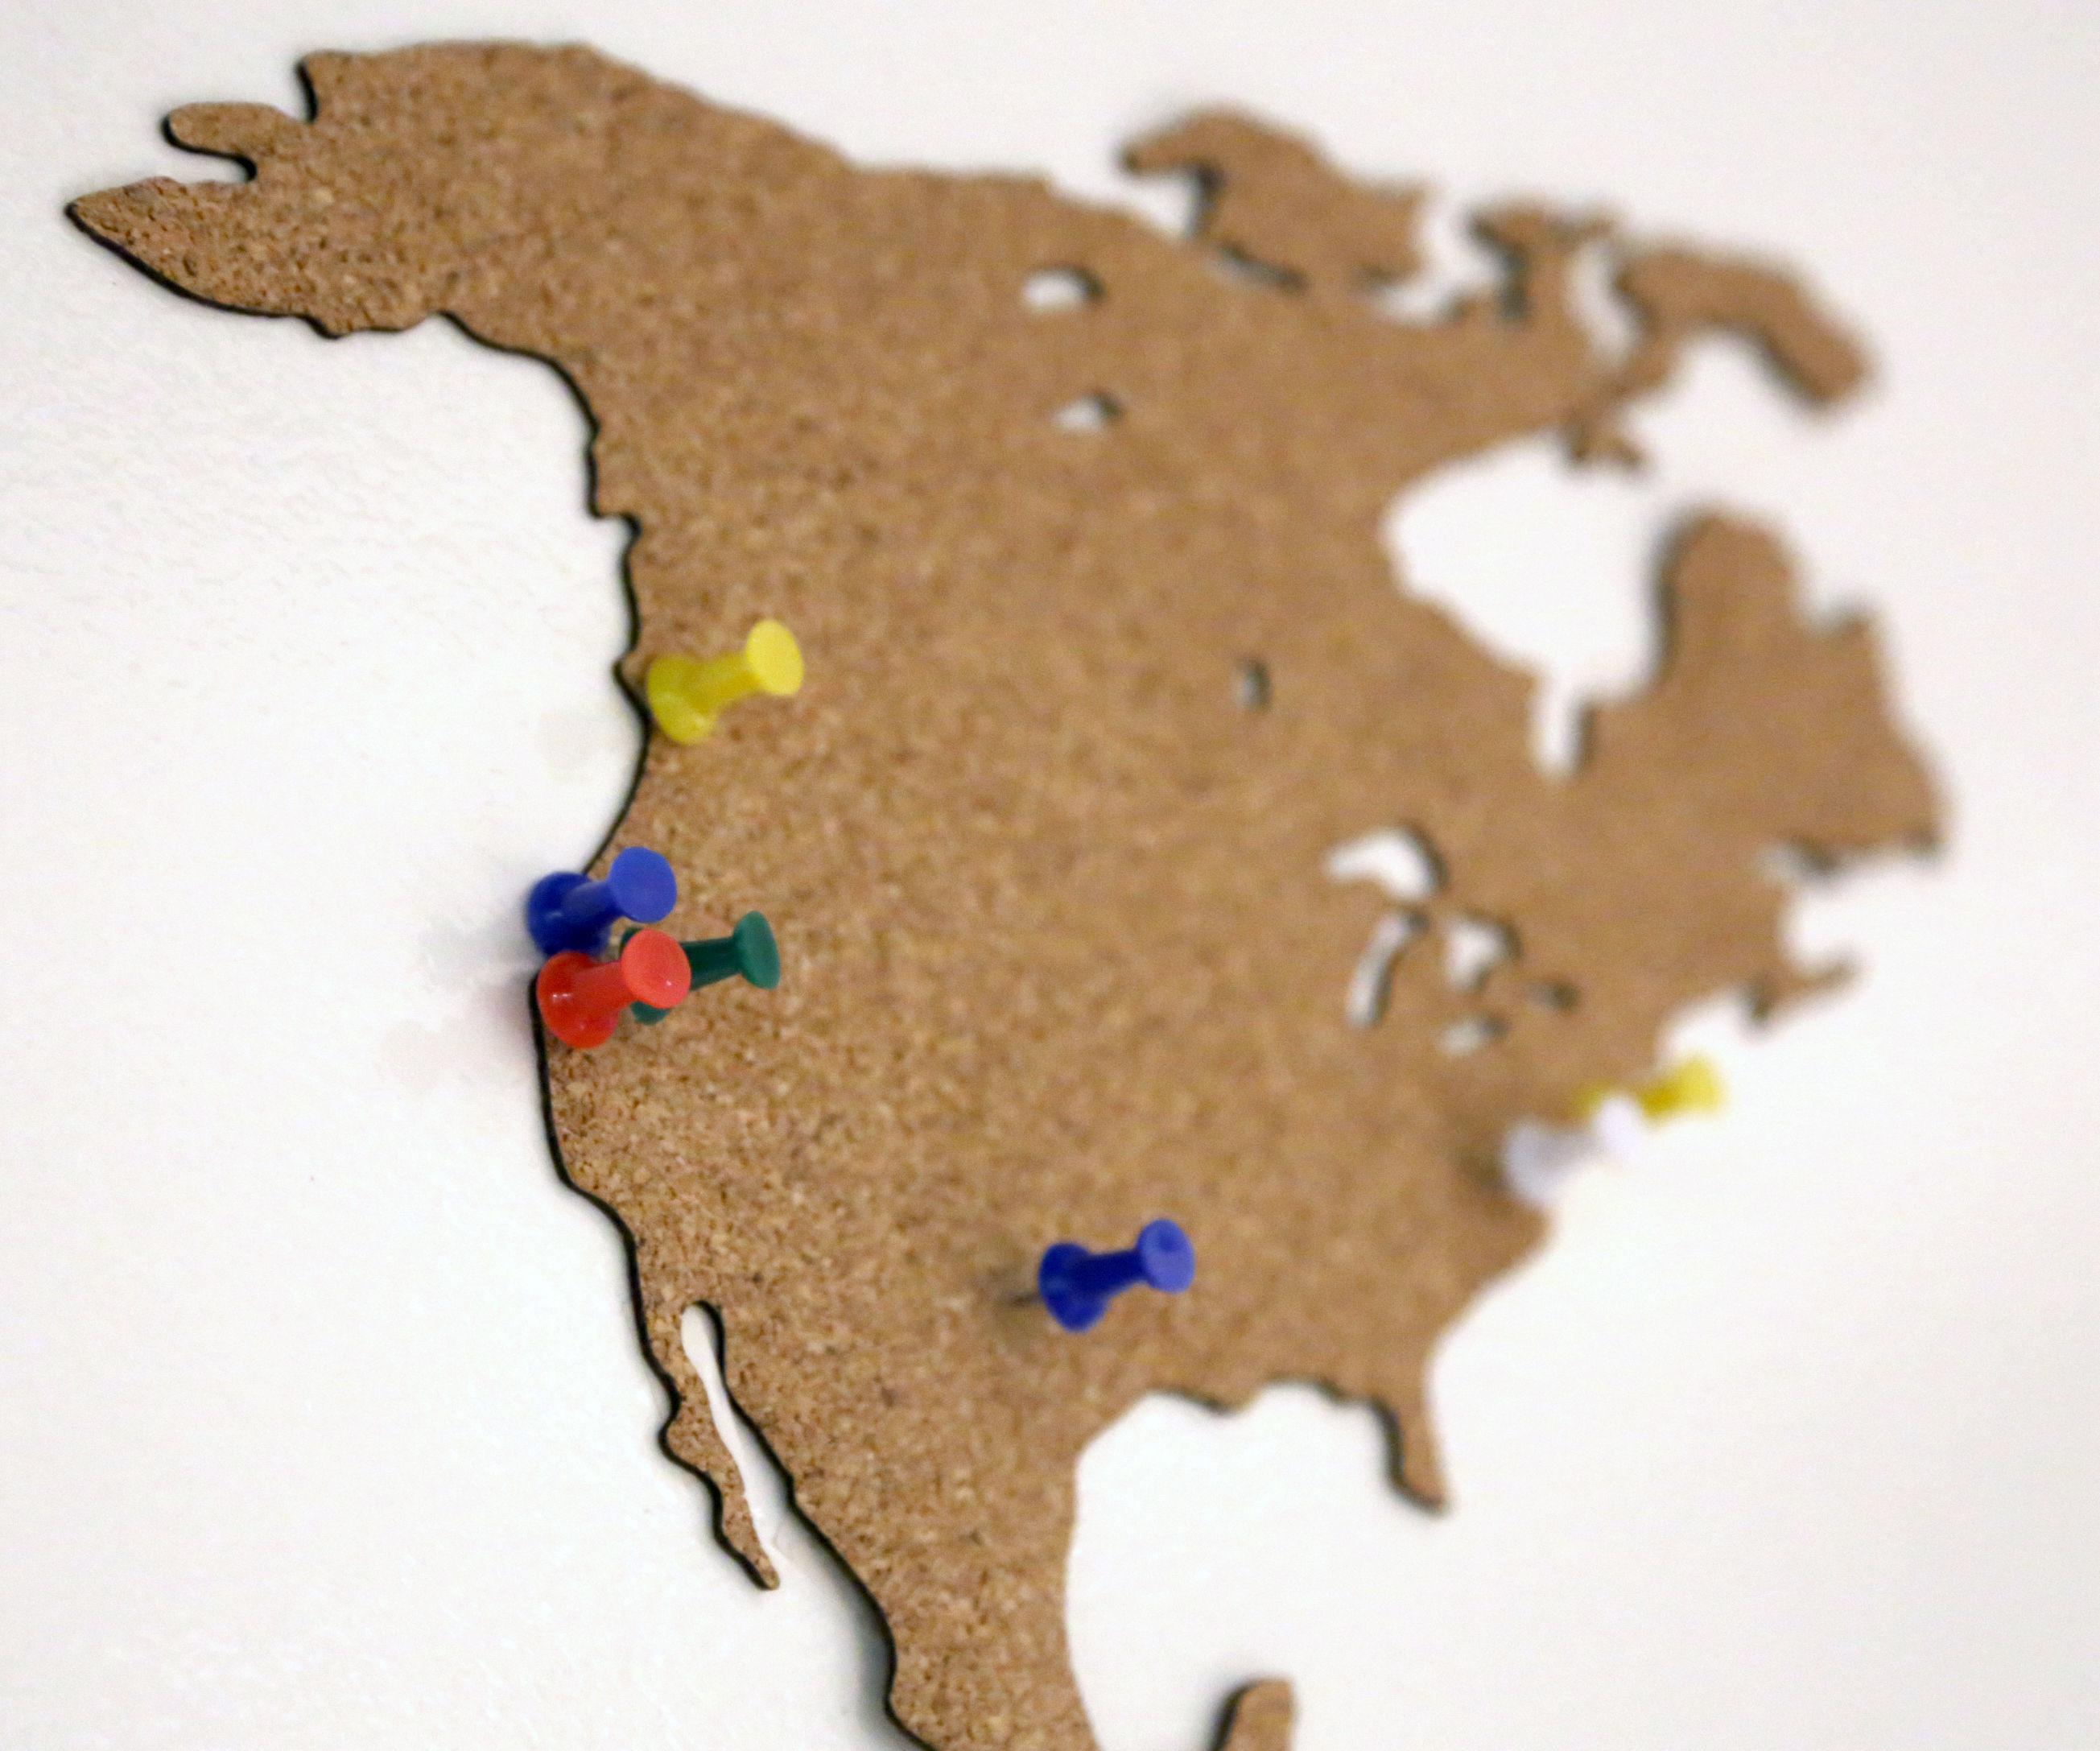 Corkmap - Lasercutting cork